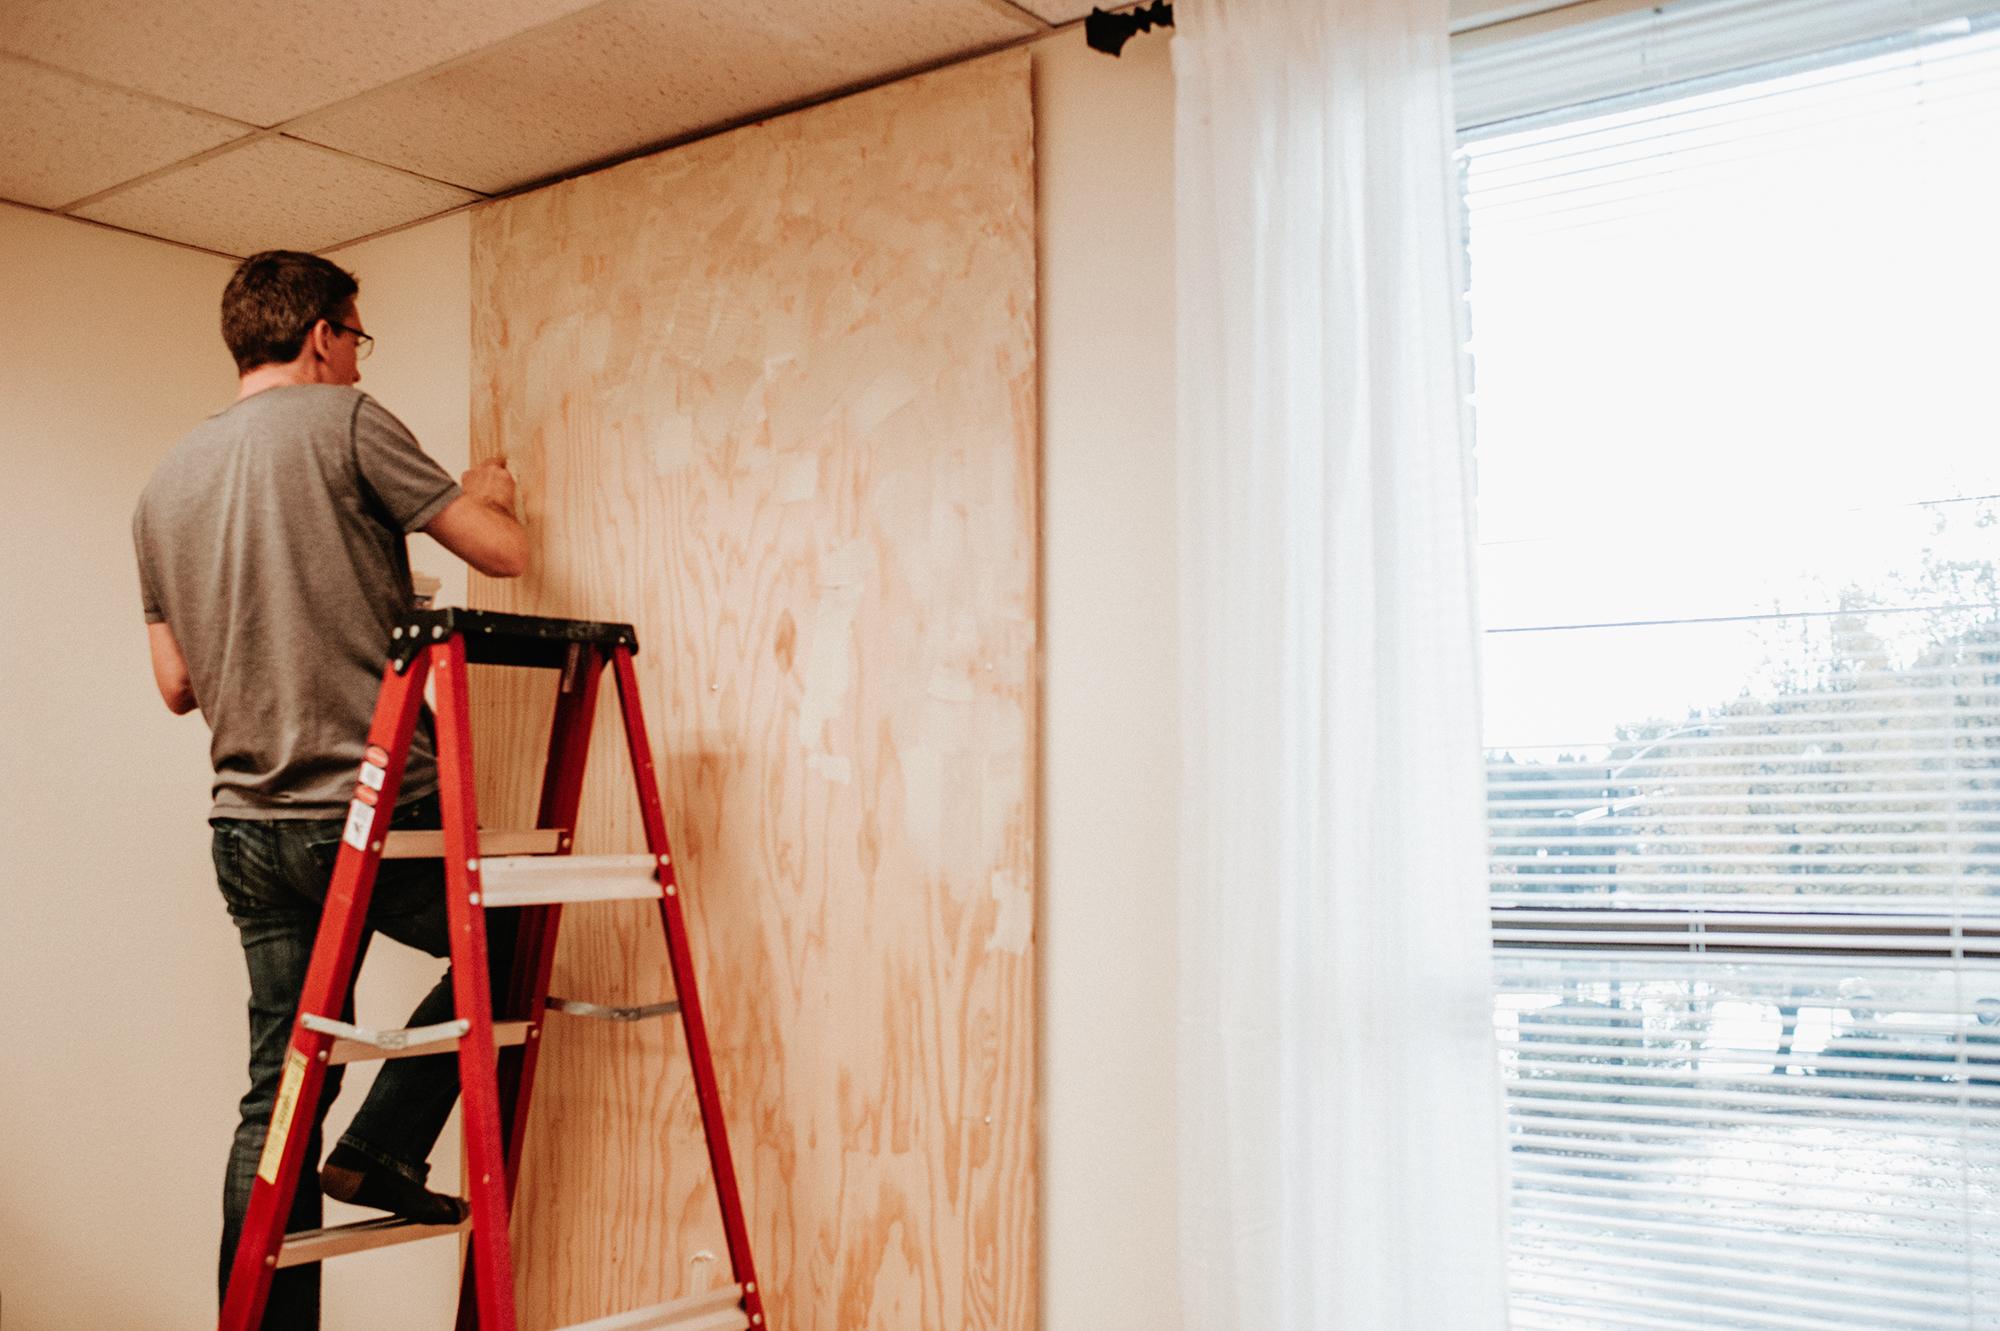 diy-cork-board-wall-mounted-on-plywood.jpg